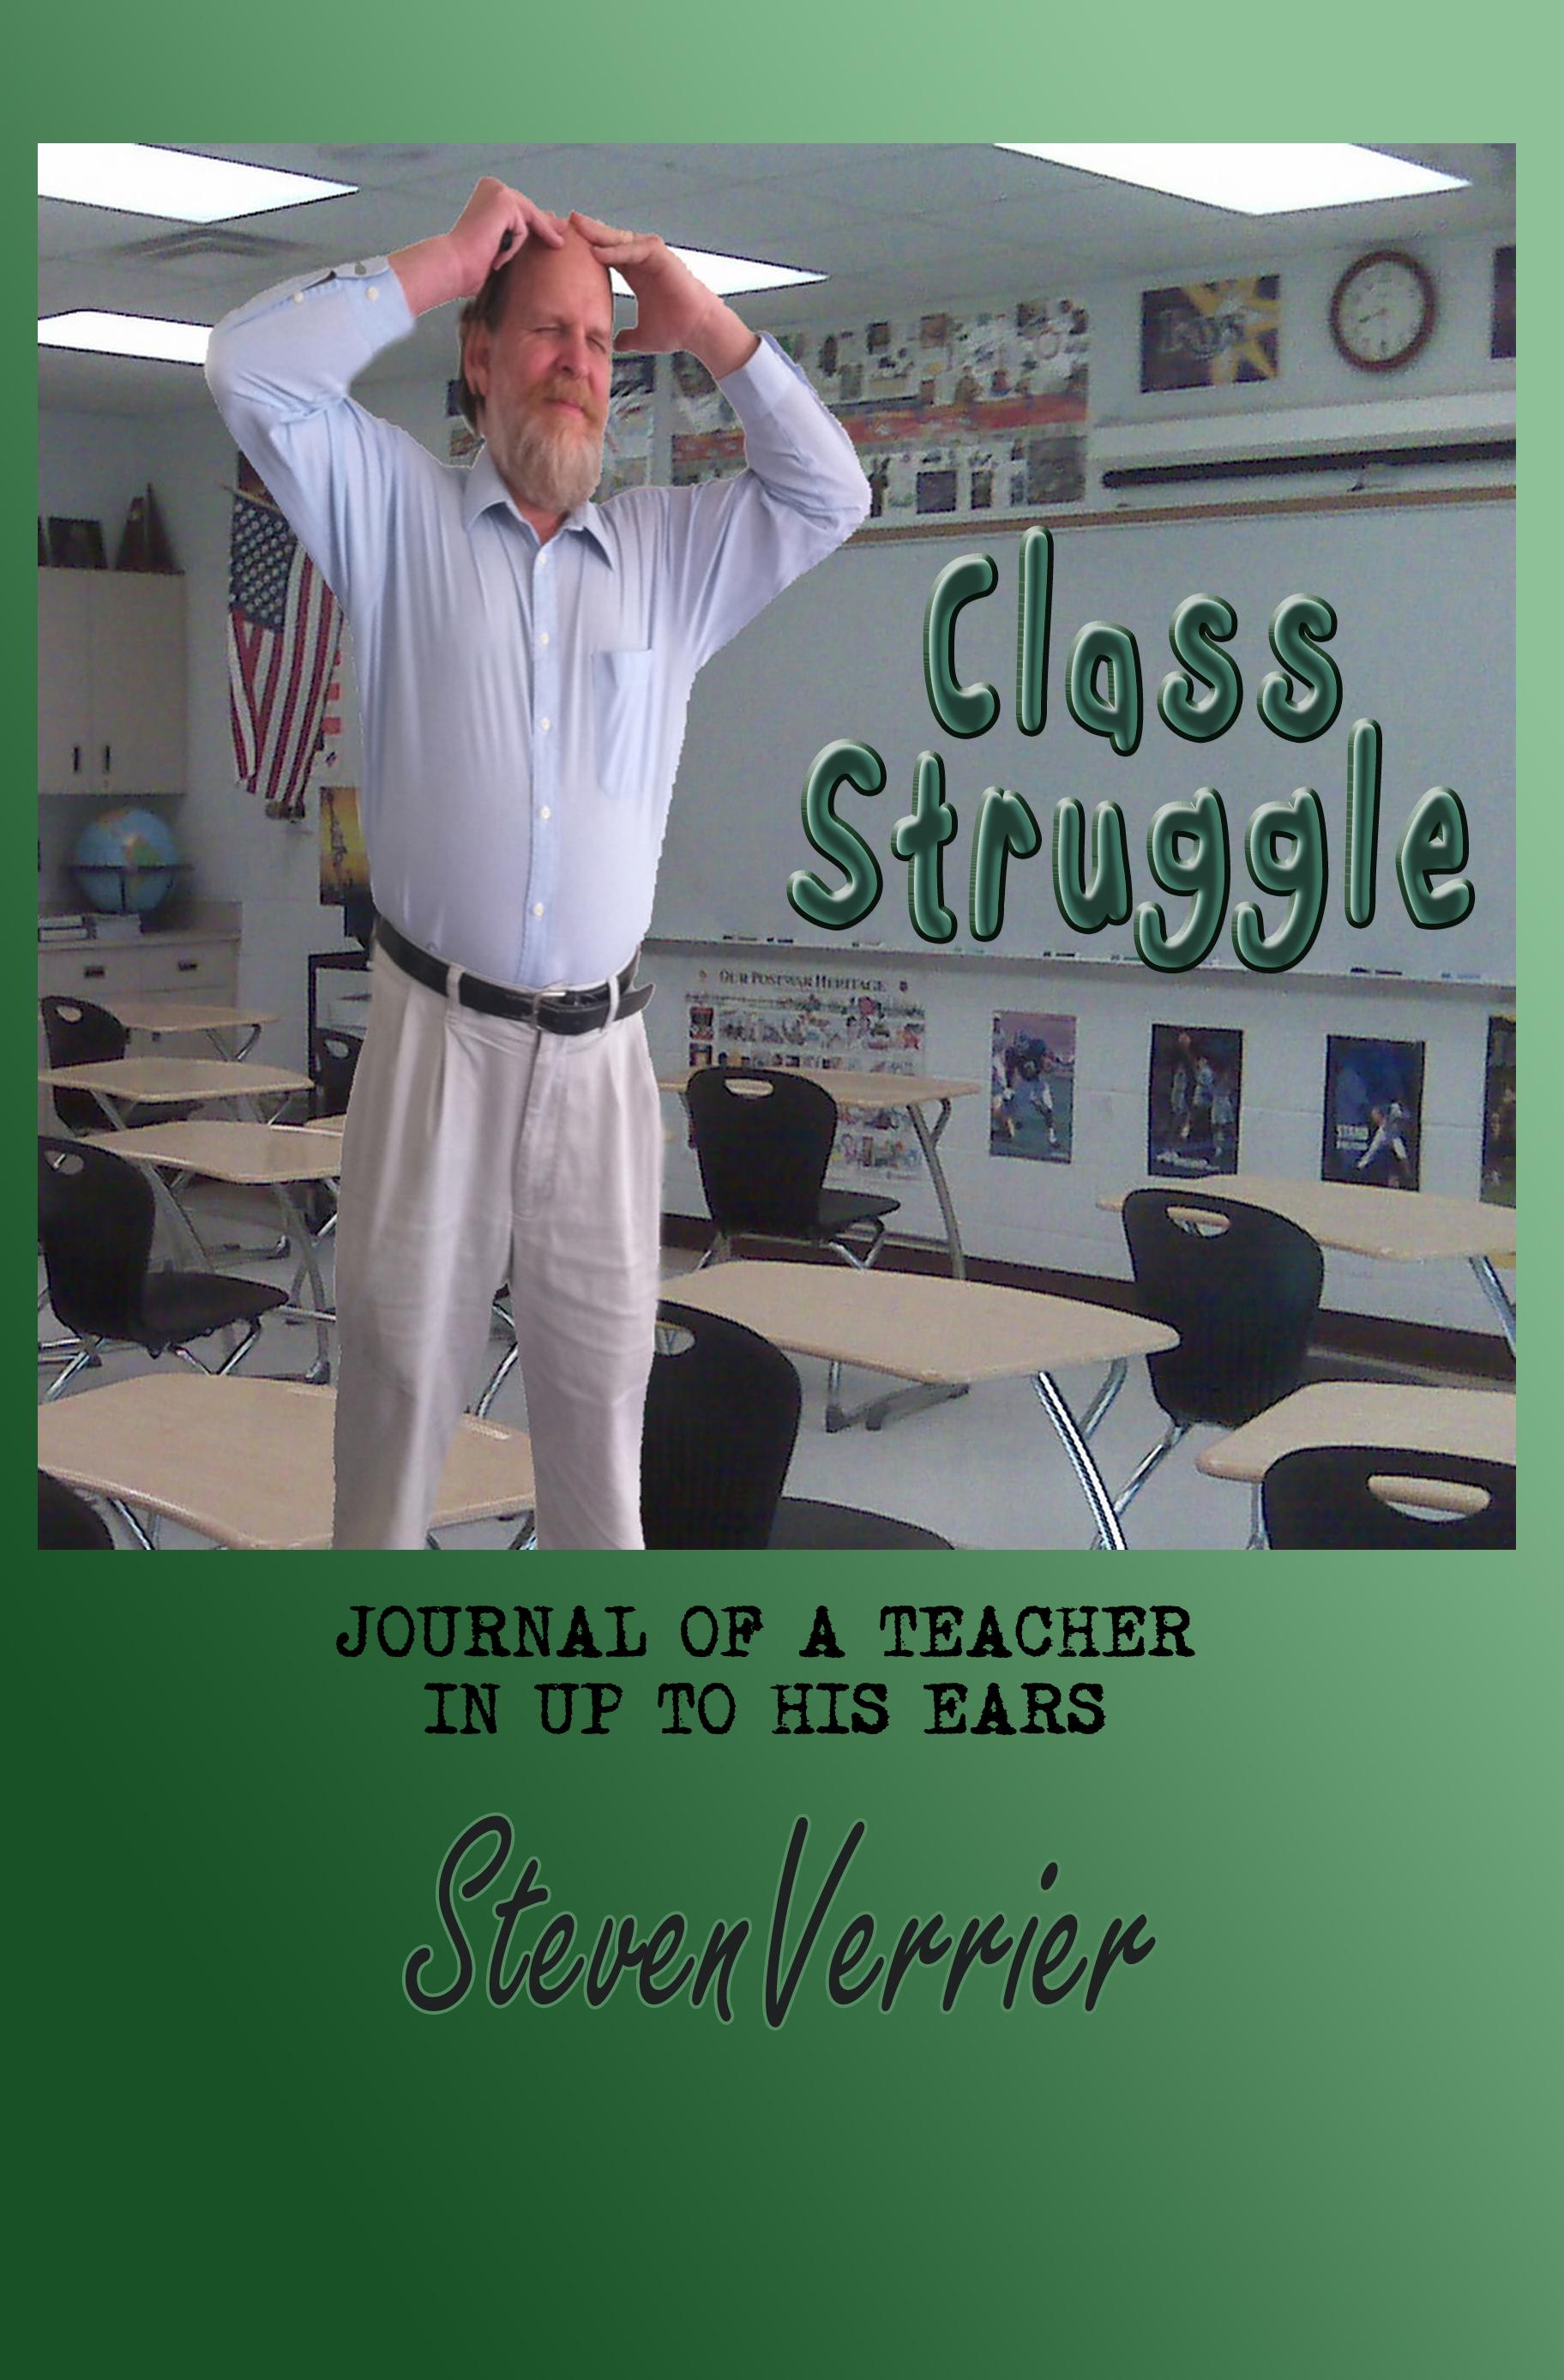 ClassStruggle